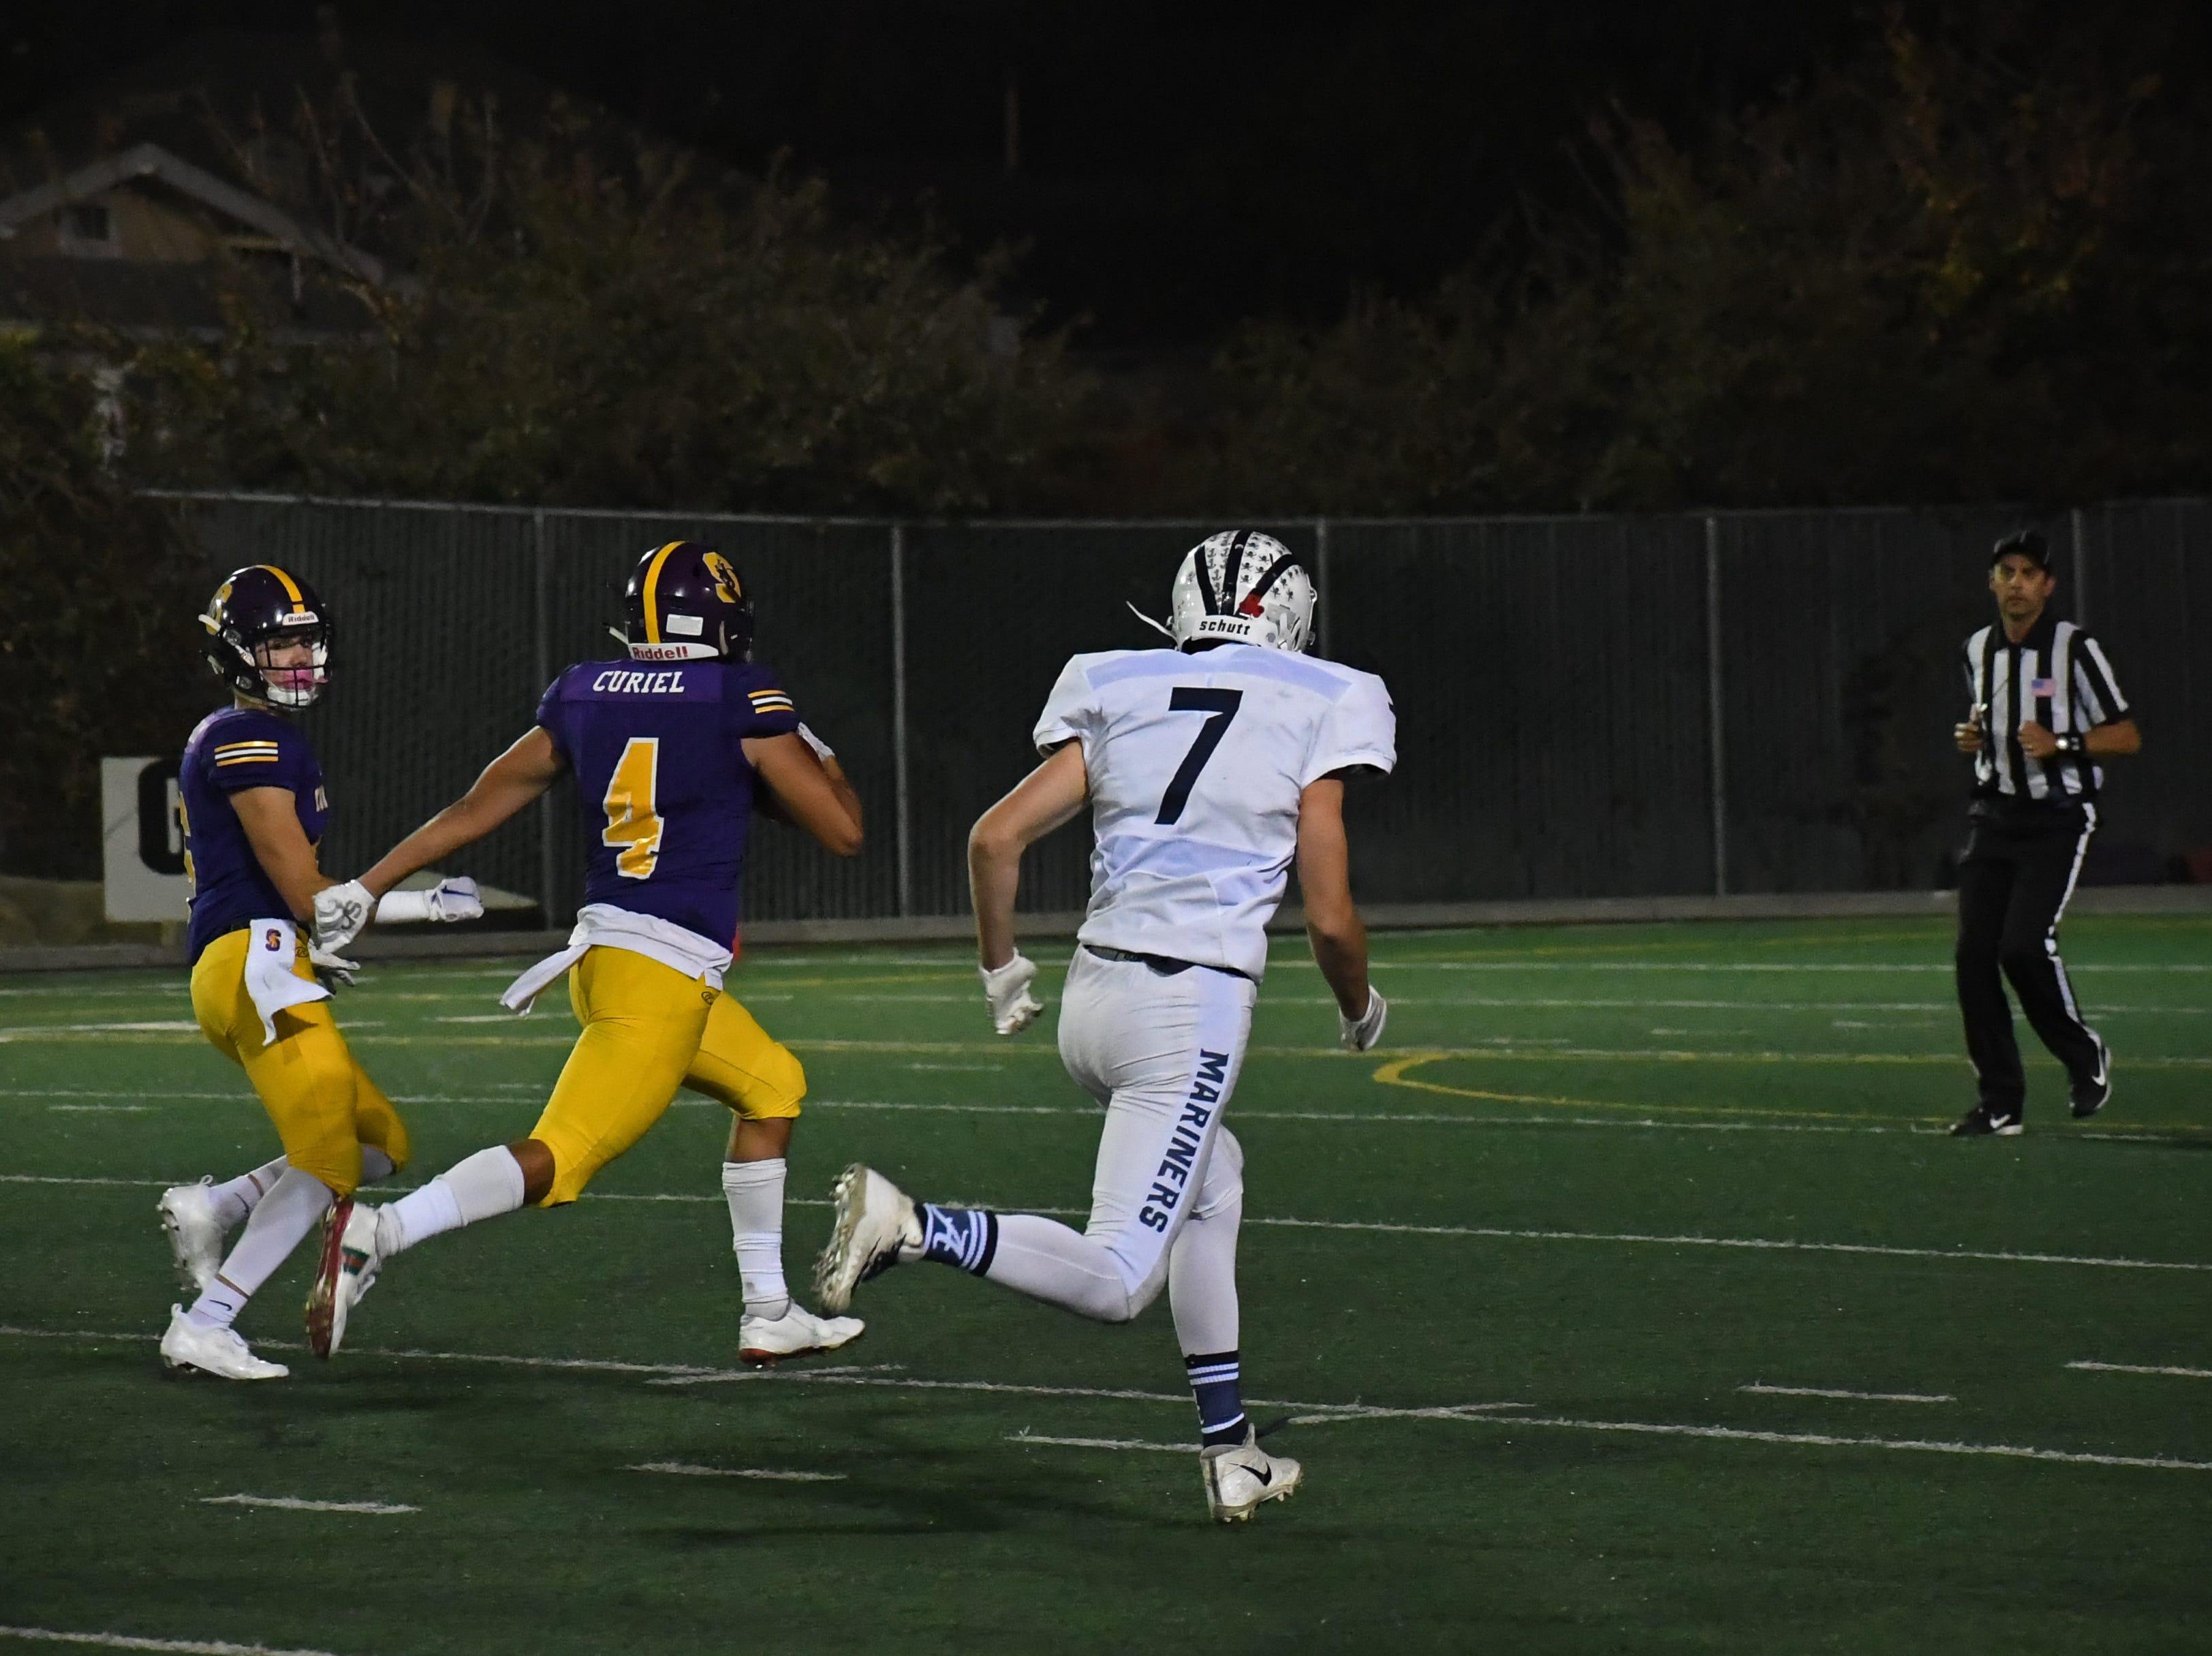 Salinas wide receiver Ivan Curiel (4) sprints past the defense for a touchdown.